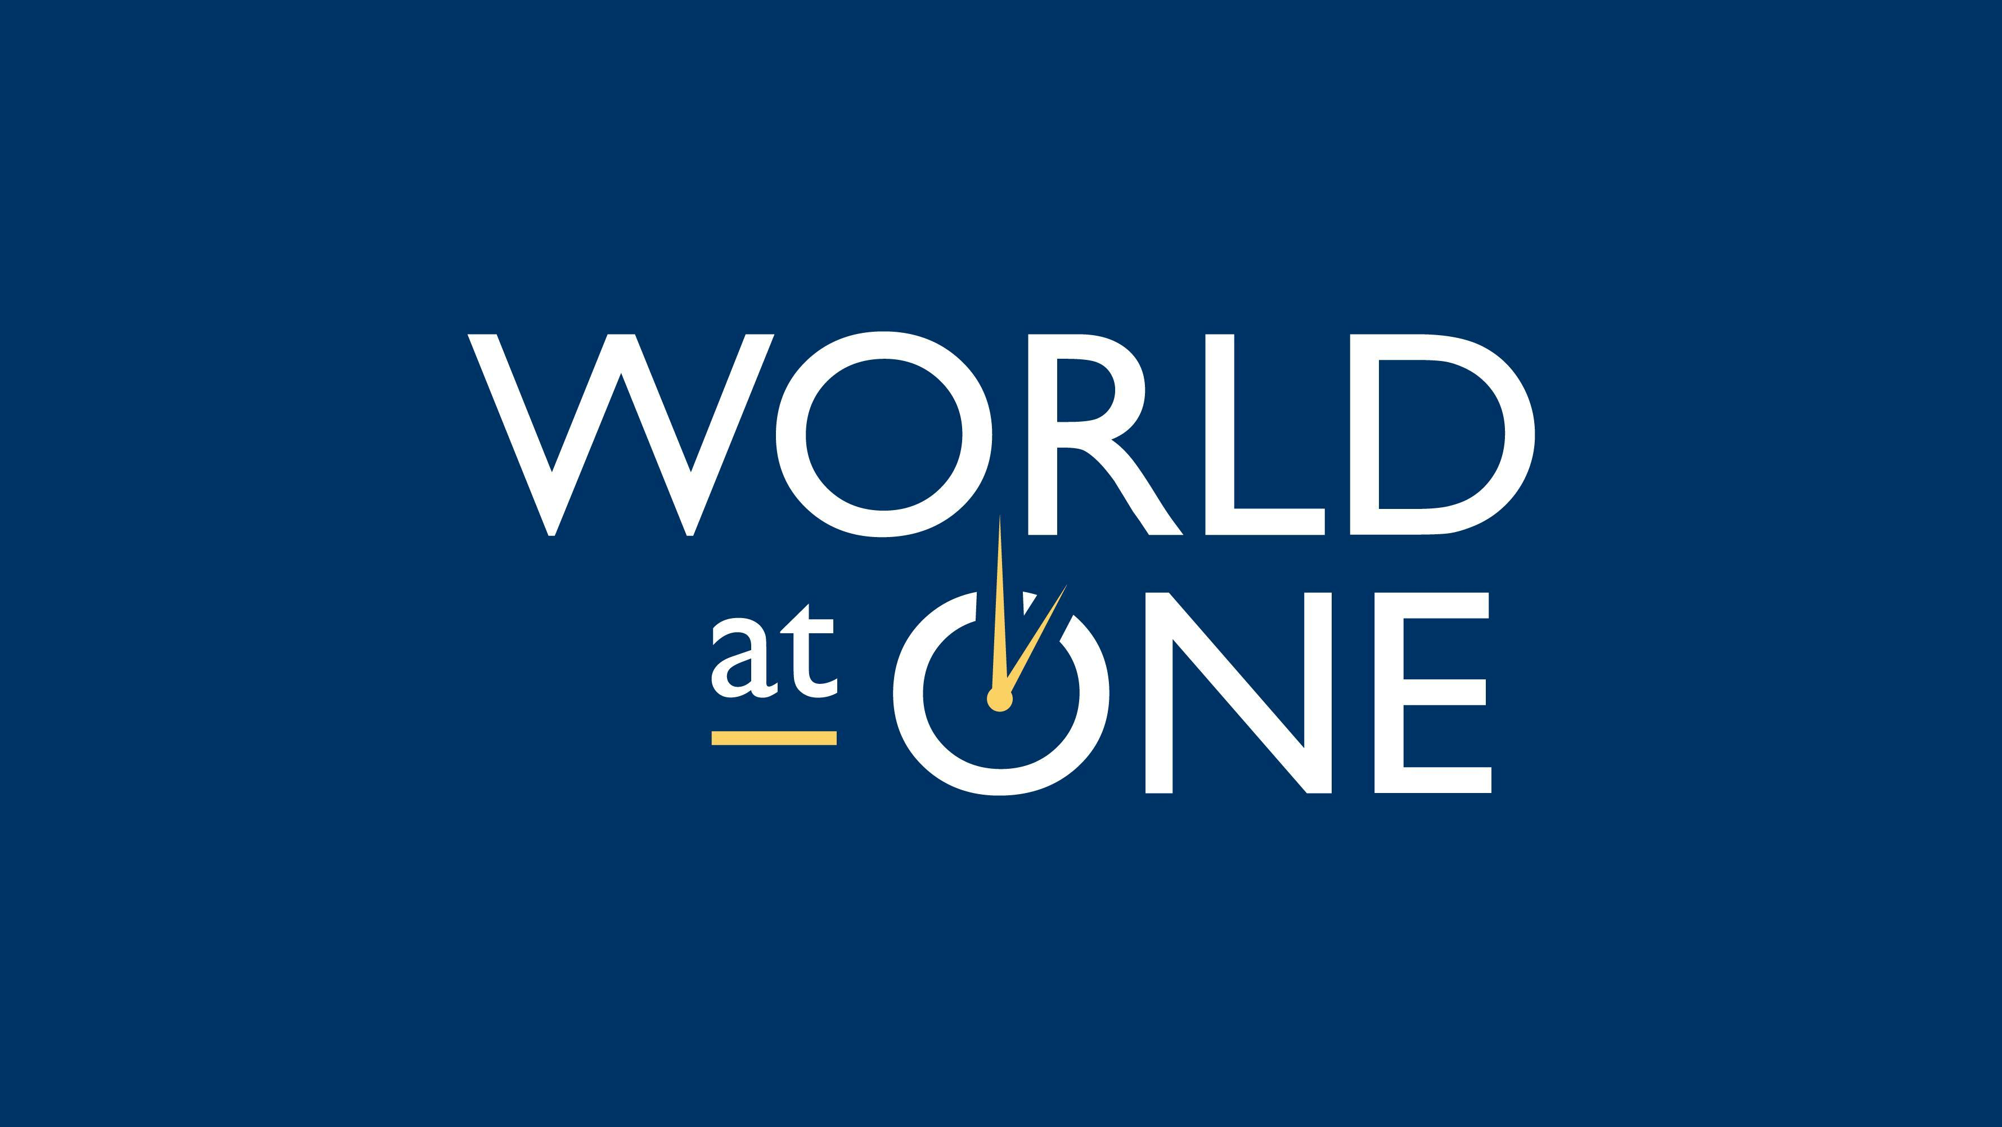 World at One logo on blue background